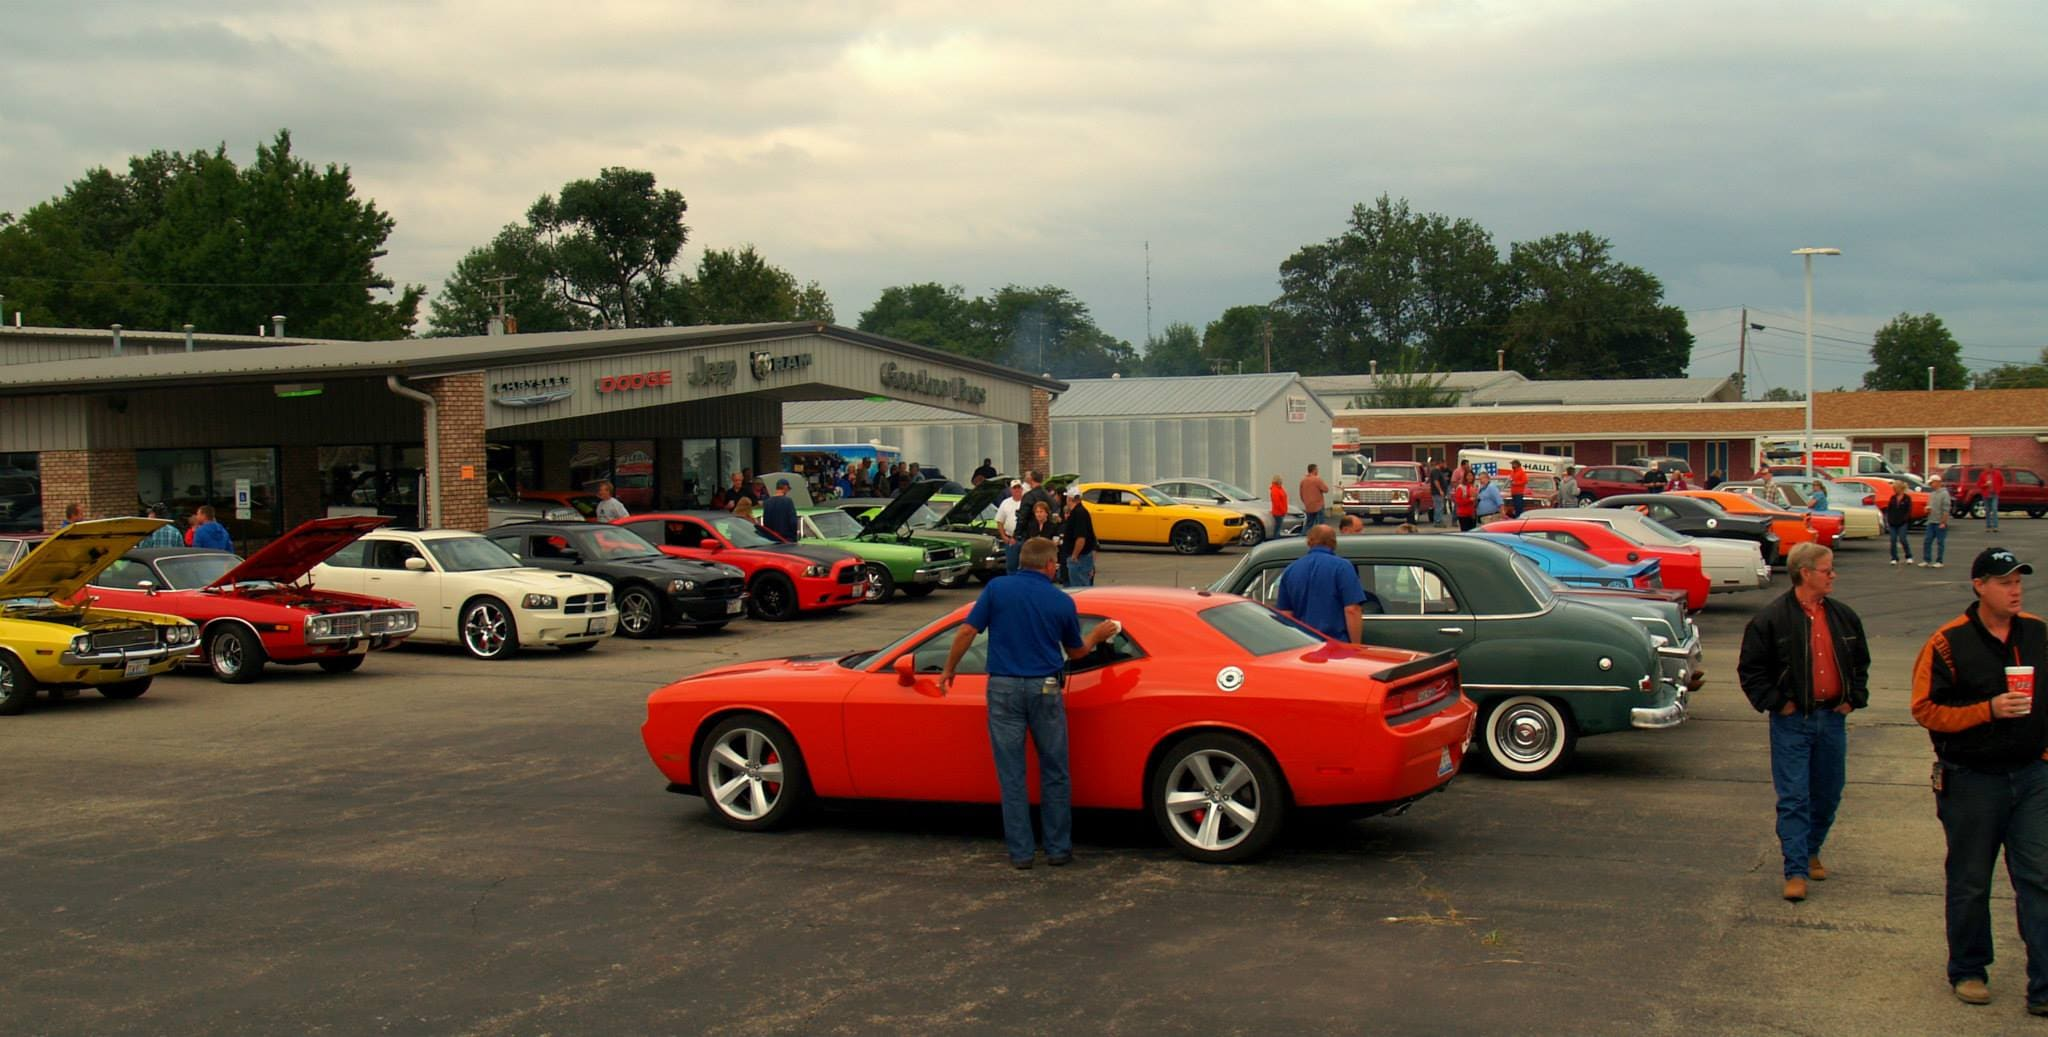 Goeckner Bros., Inc. | New Chrysler, Dodge, Jeep, Ram dealership ...